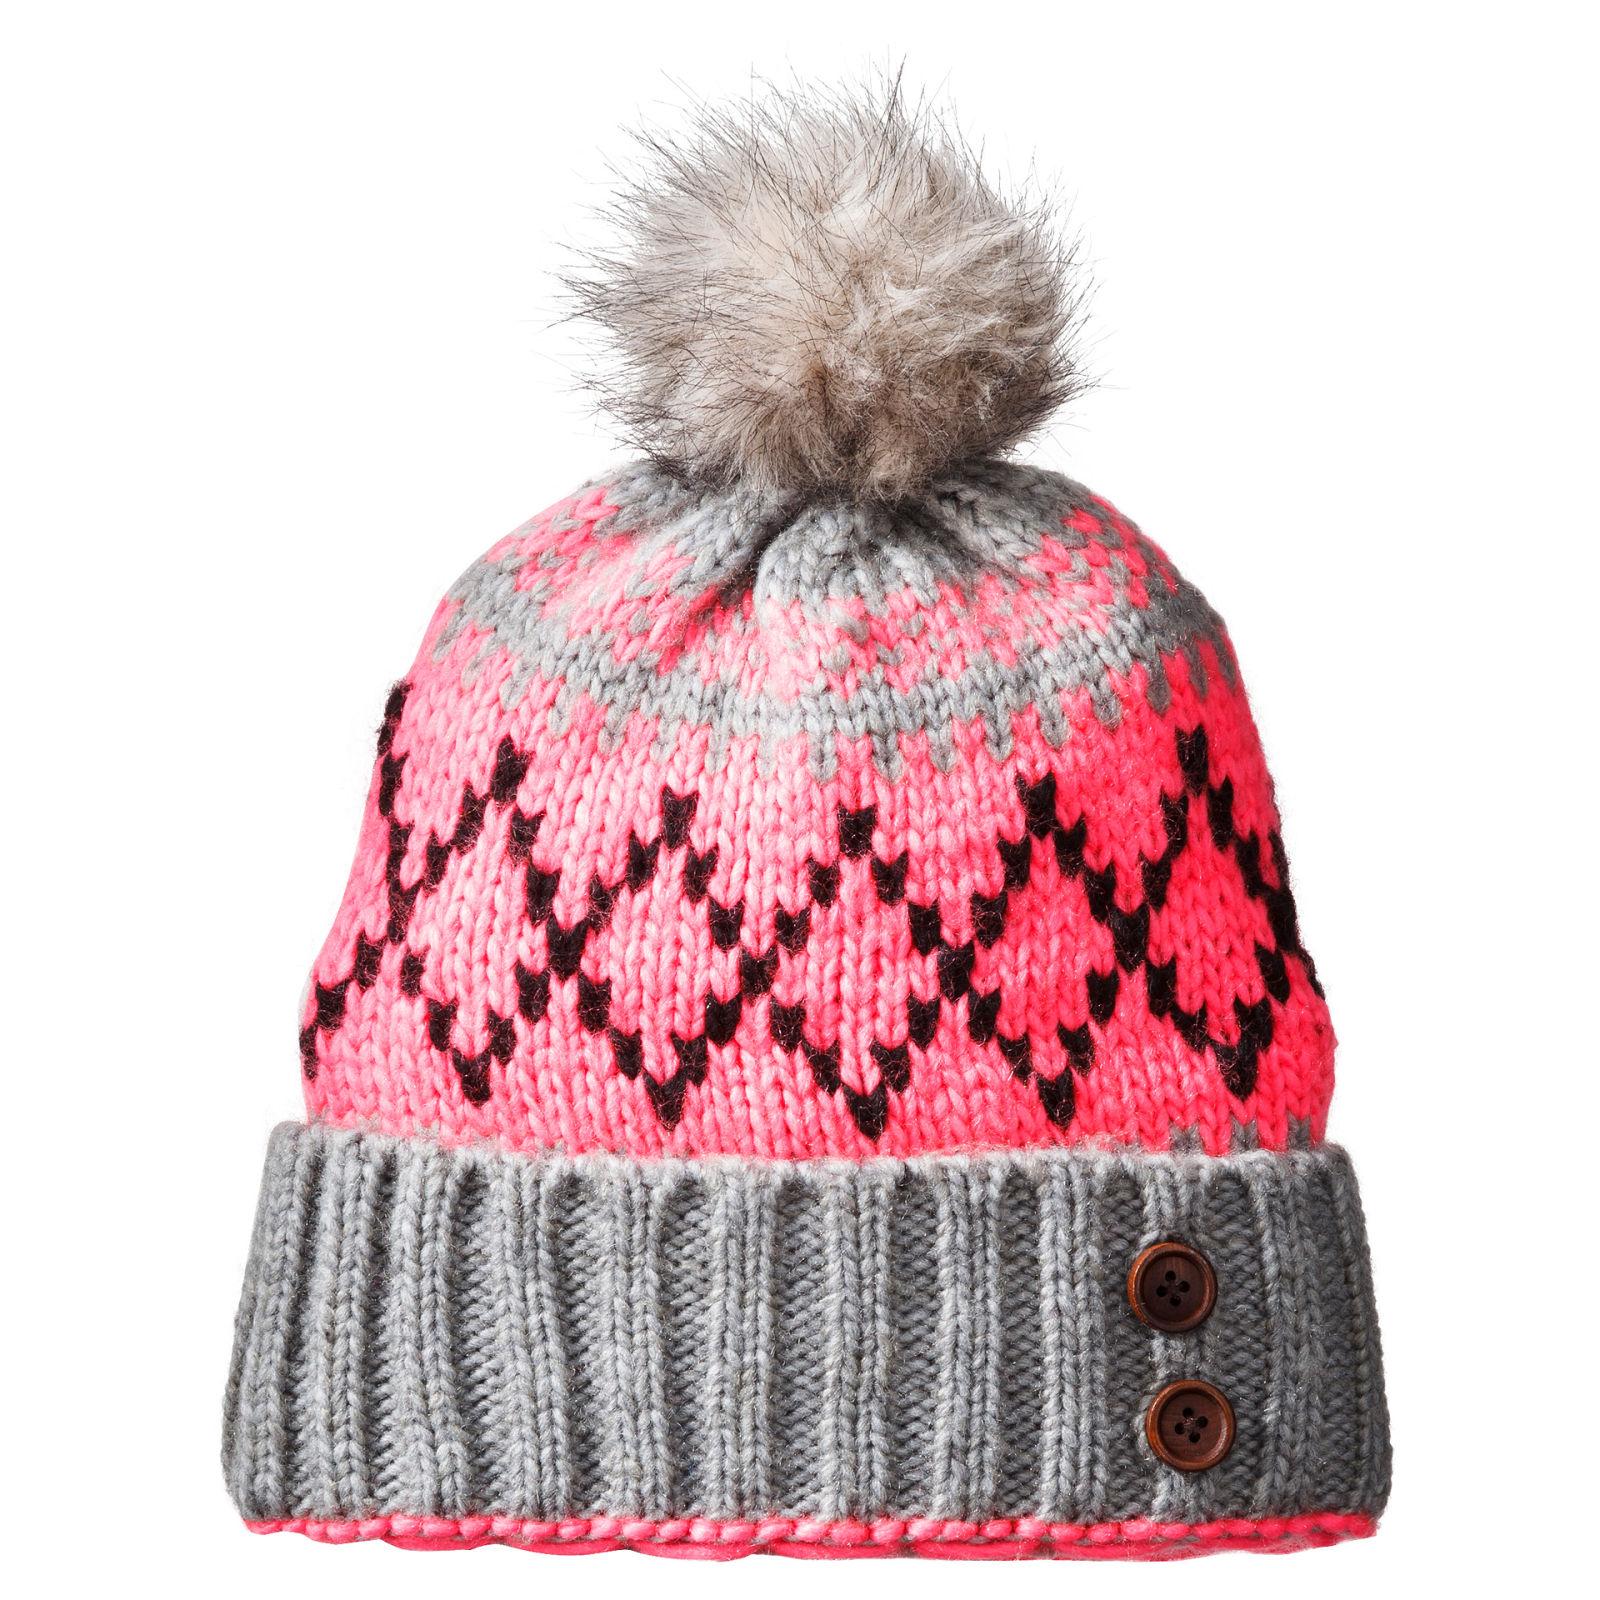 winter hats for women stylish winter hats. Black Bedroom Furniture Sets. Home Design Ideas